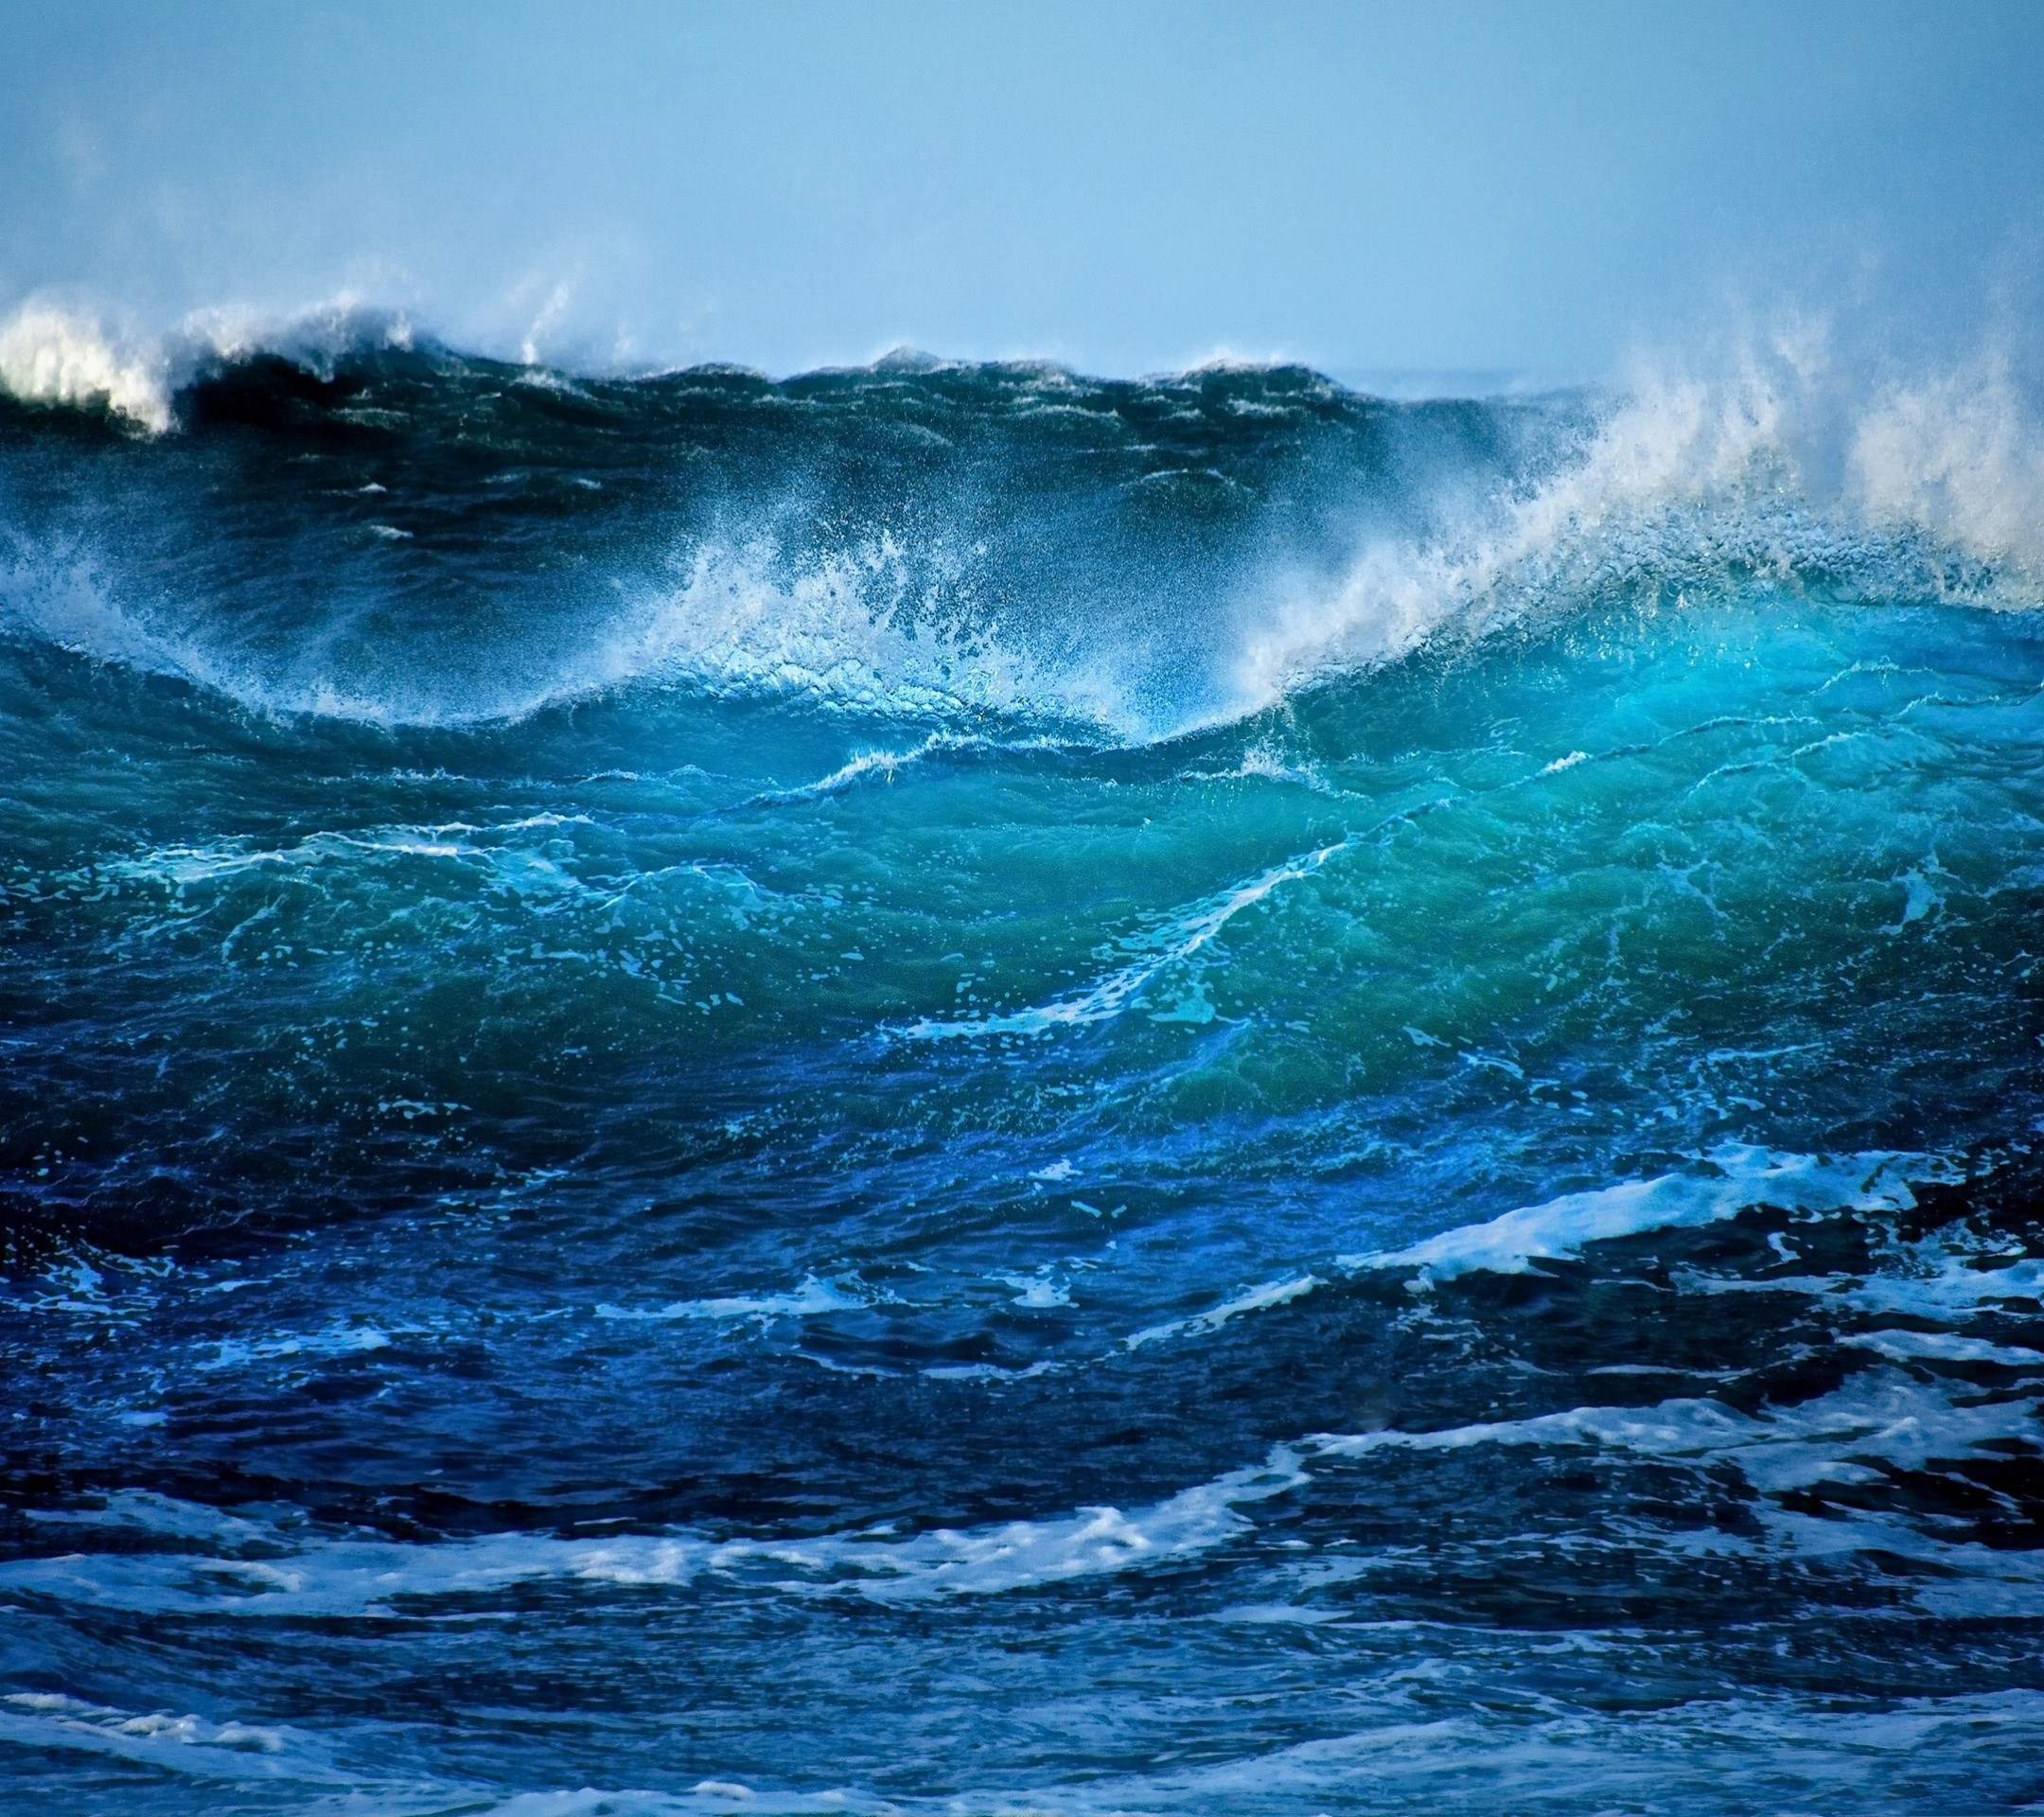 Waves Wallpapers: Clark Little Wallpaper (59+ Images